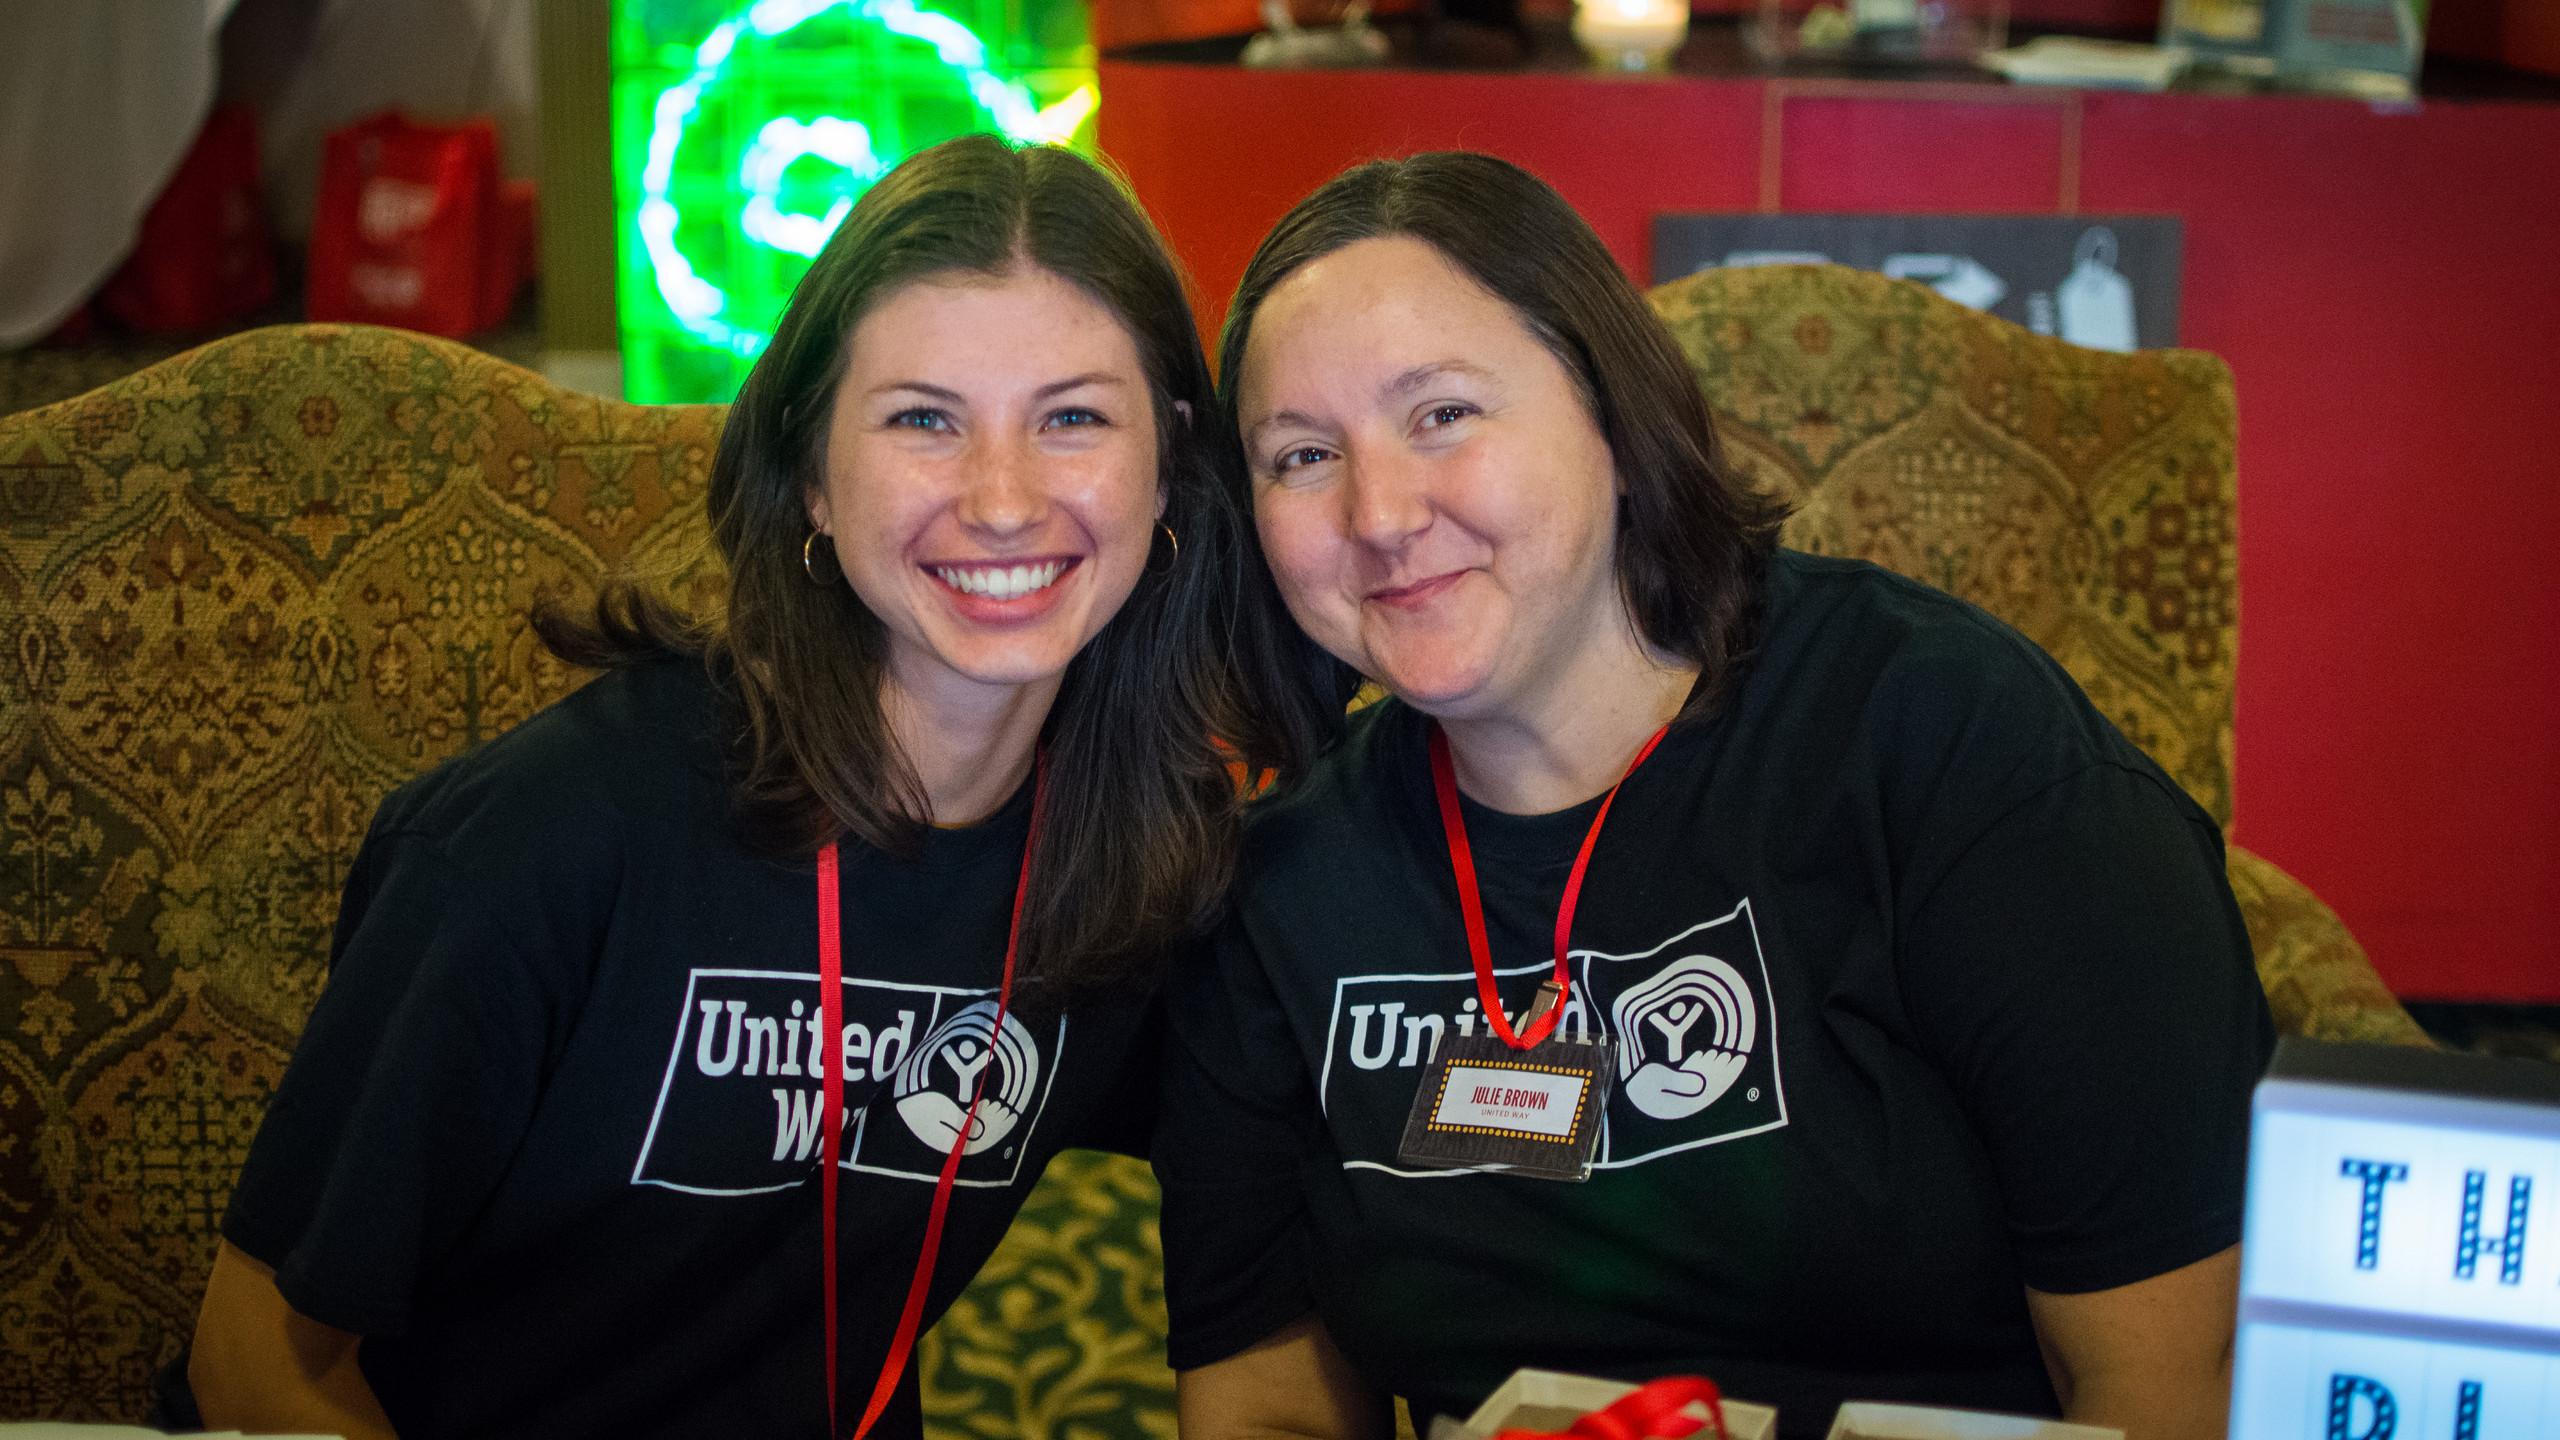 Sarah Wood and Julie Brown